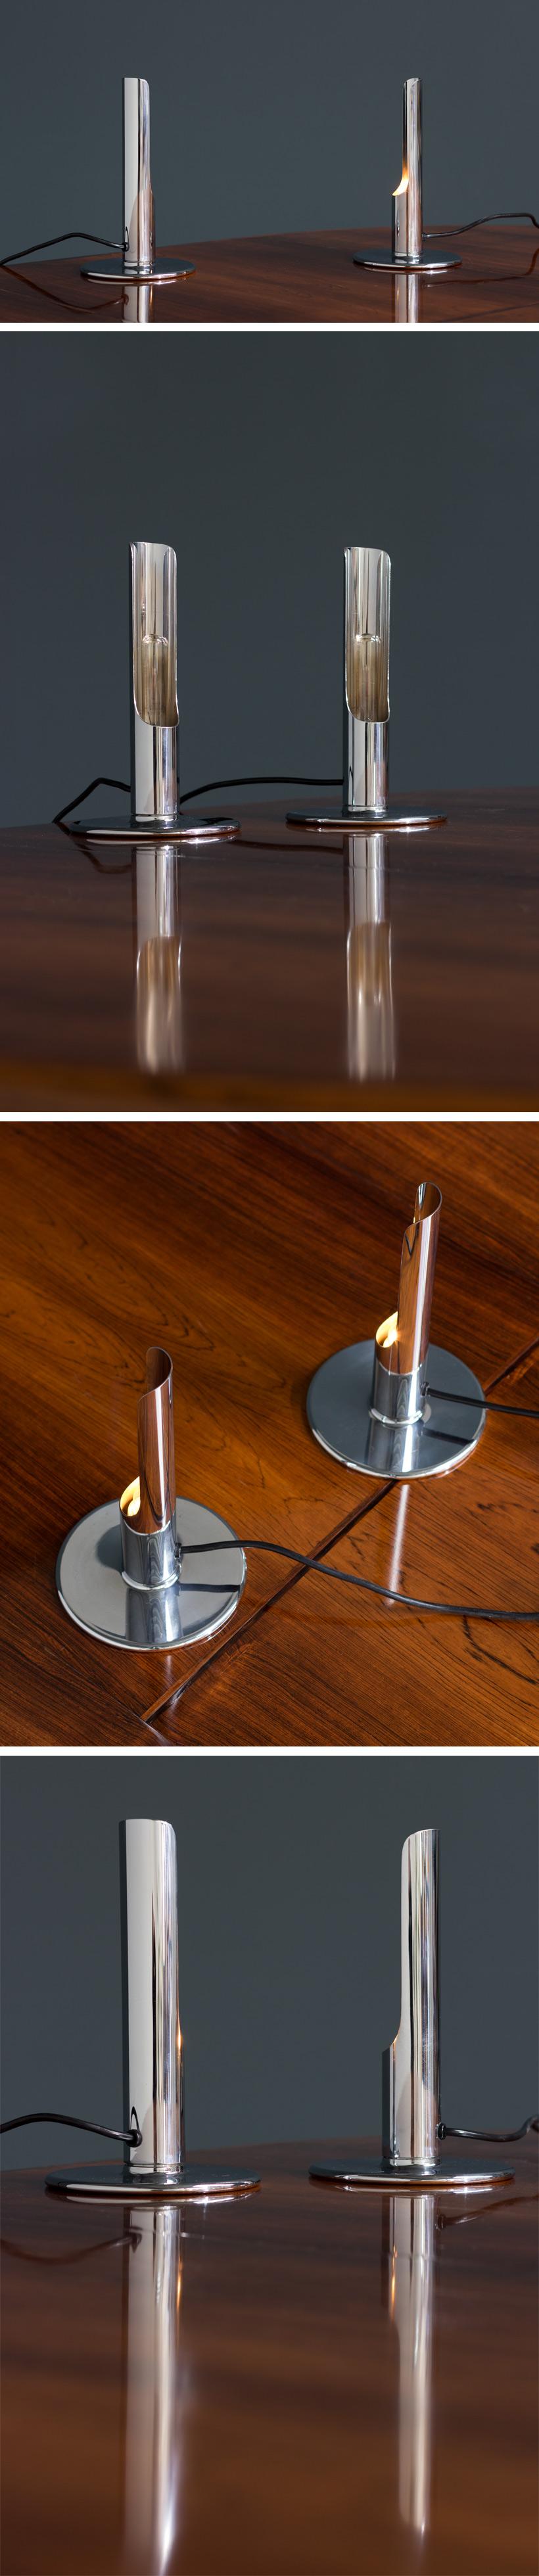 Ingo Maurer Pair table lamps model Prix for M Design Large